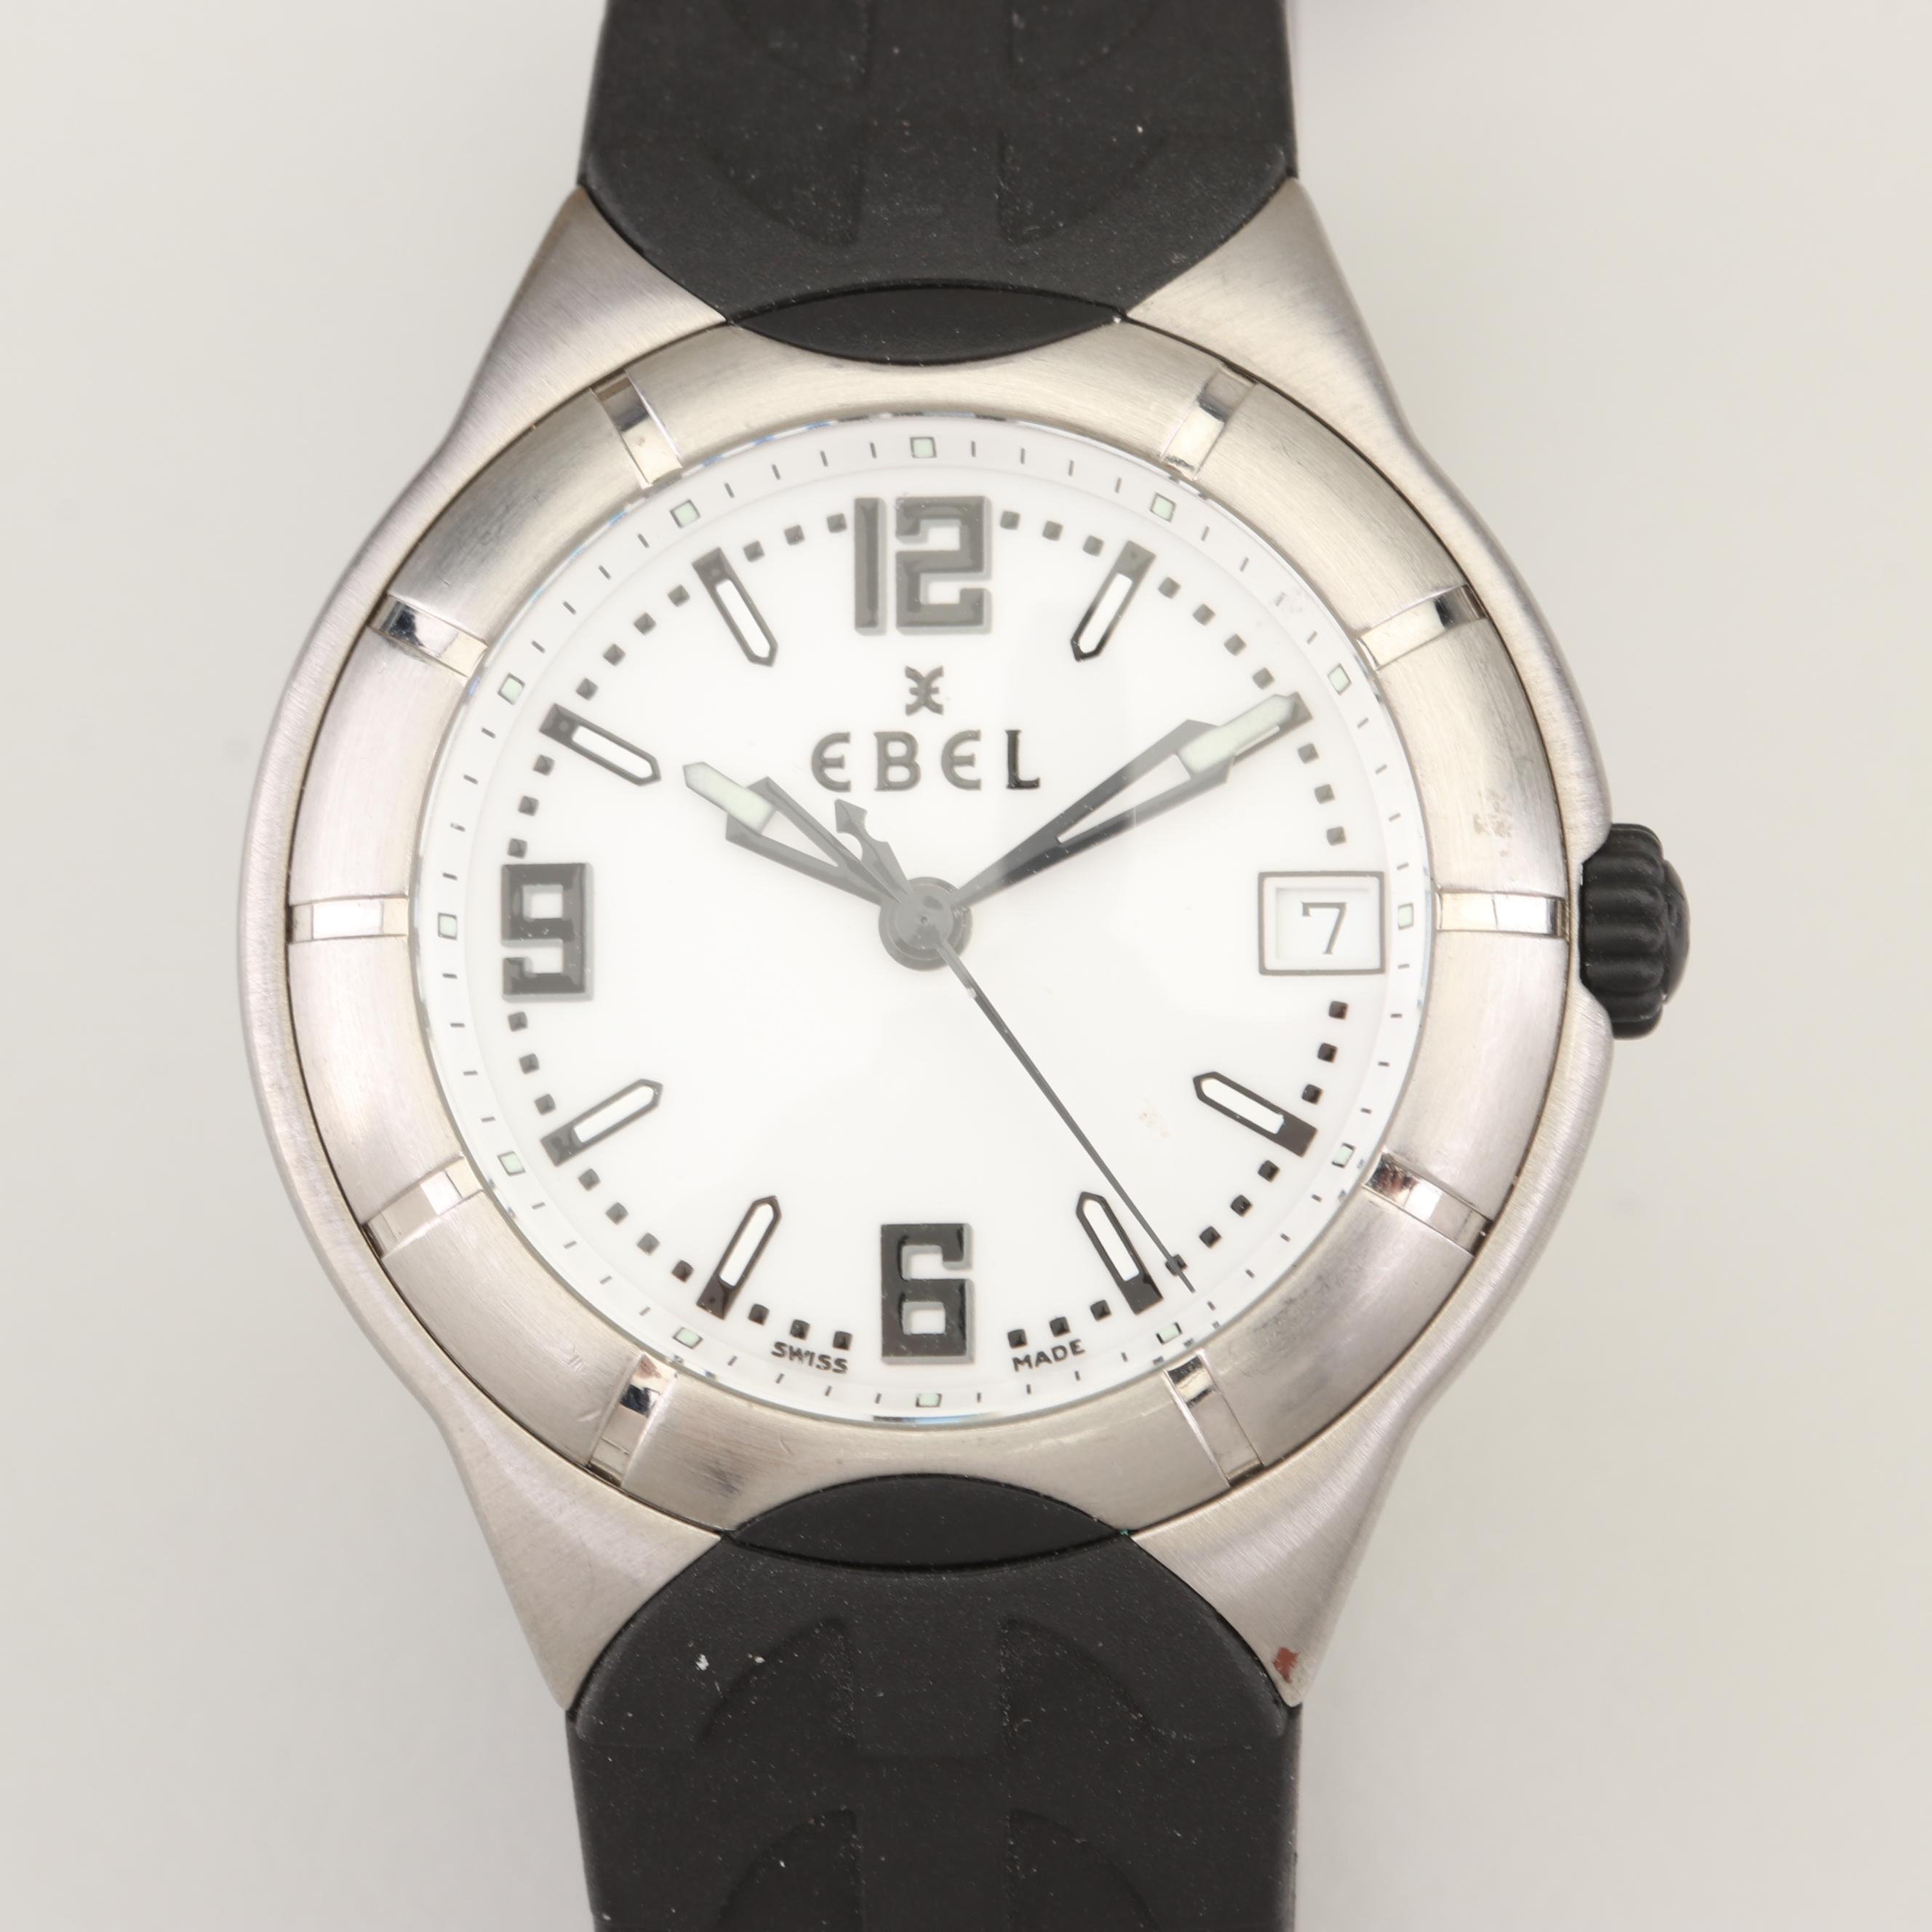 Ebel Type E Stainless Steel Wristwatch